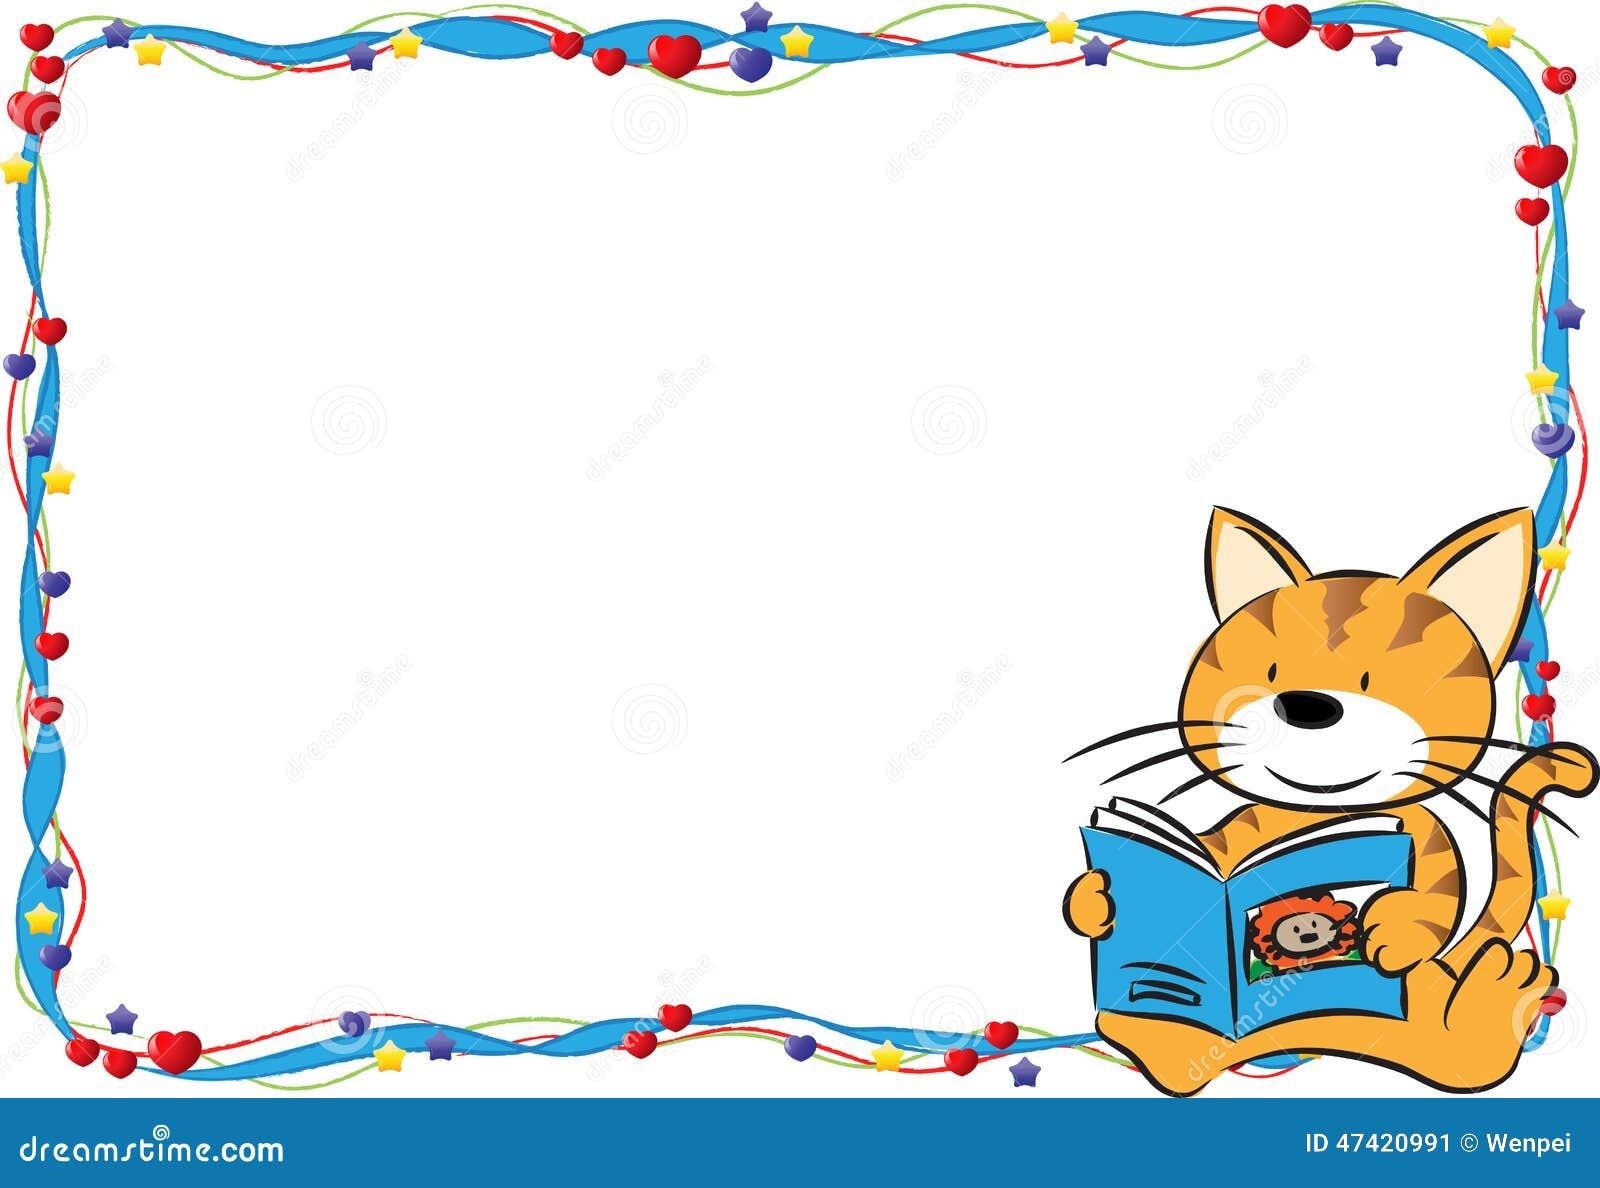 Cartoon Character Border Design : Card border frame stock illustration of book